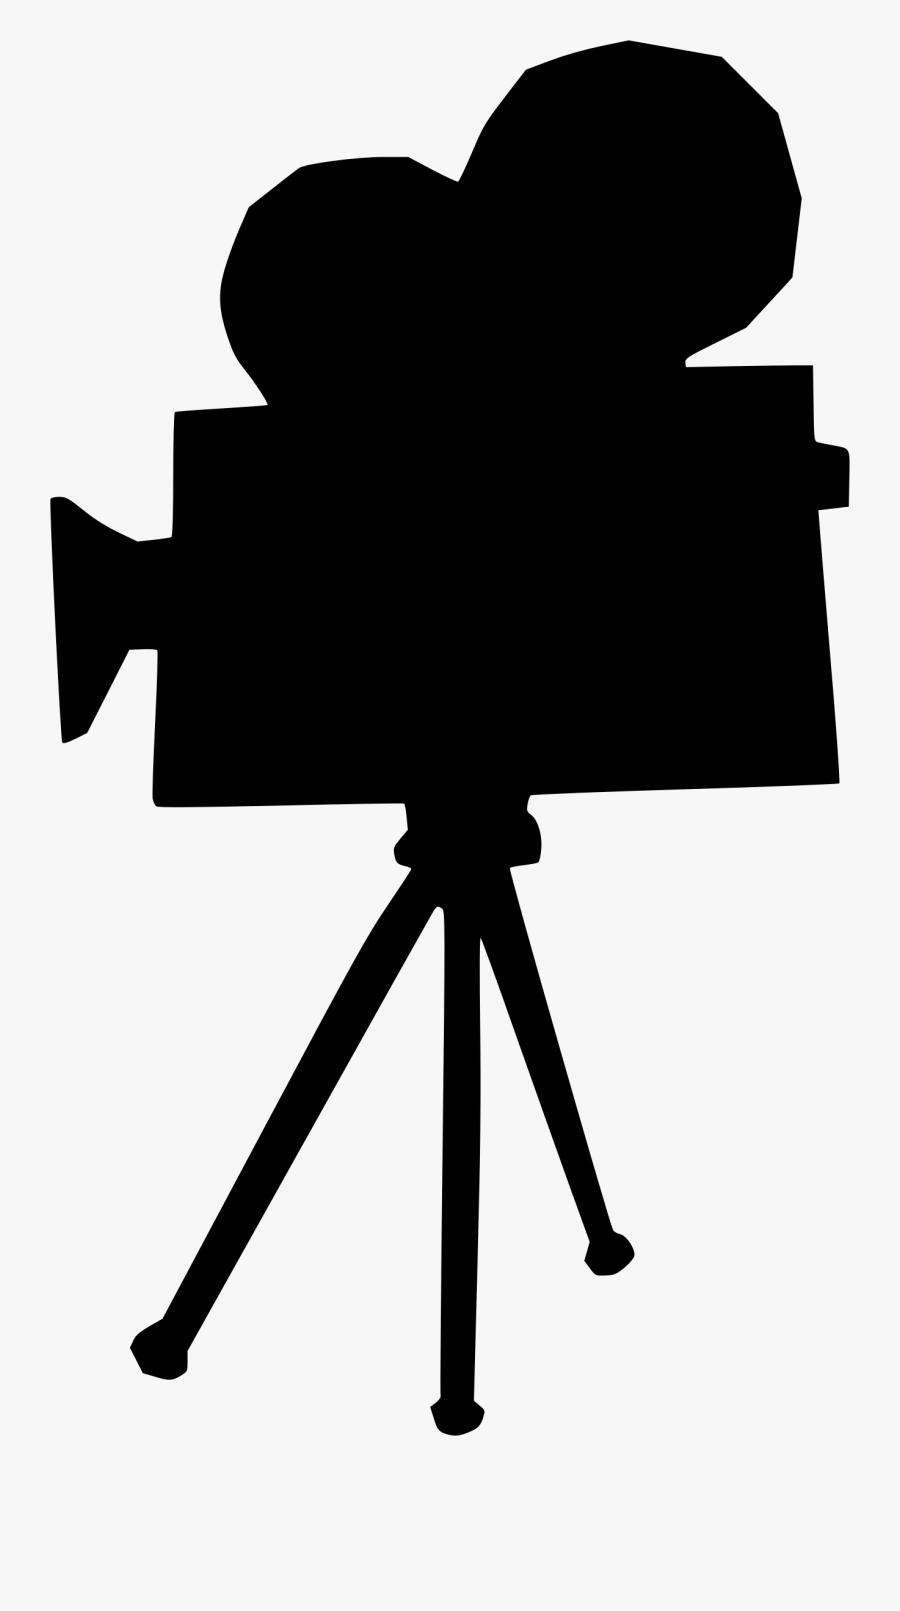 Transparent Film Clipart - Movie Film Projector Clipart, Transparent Clipart